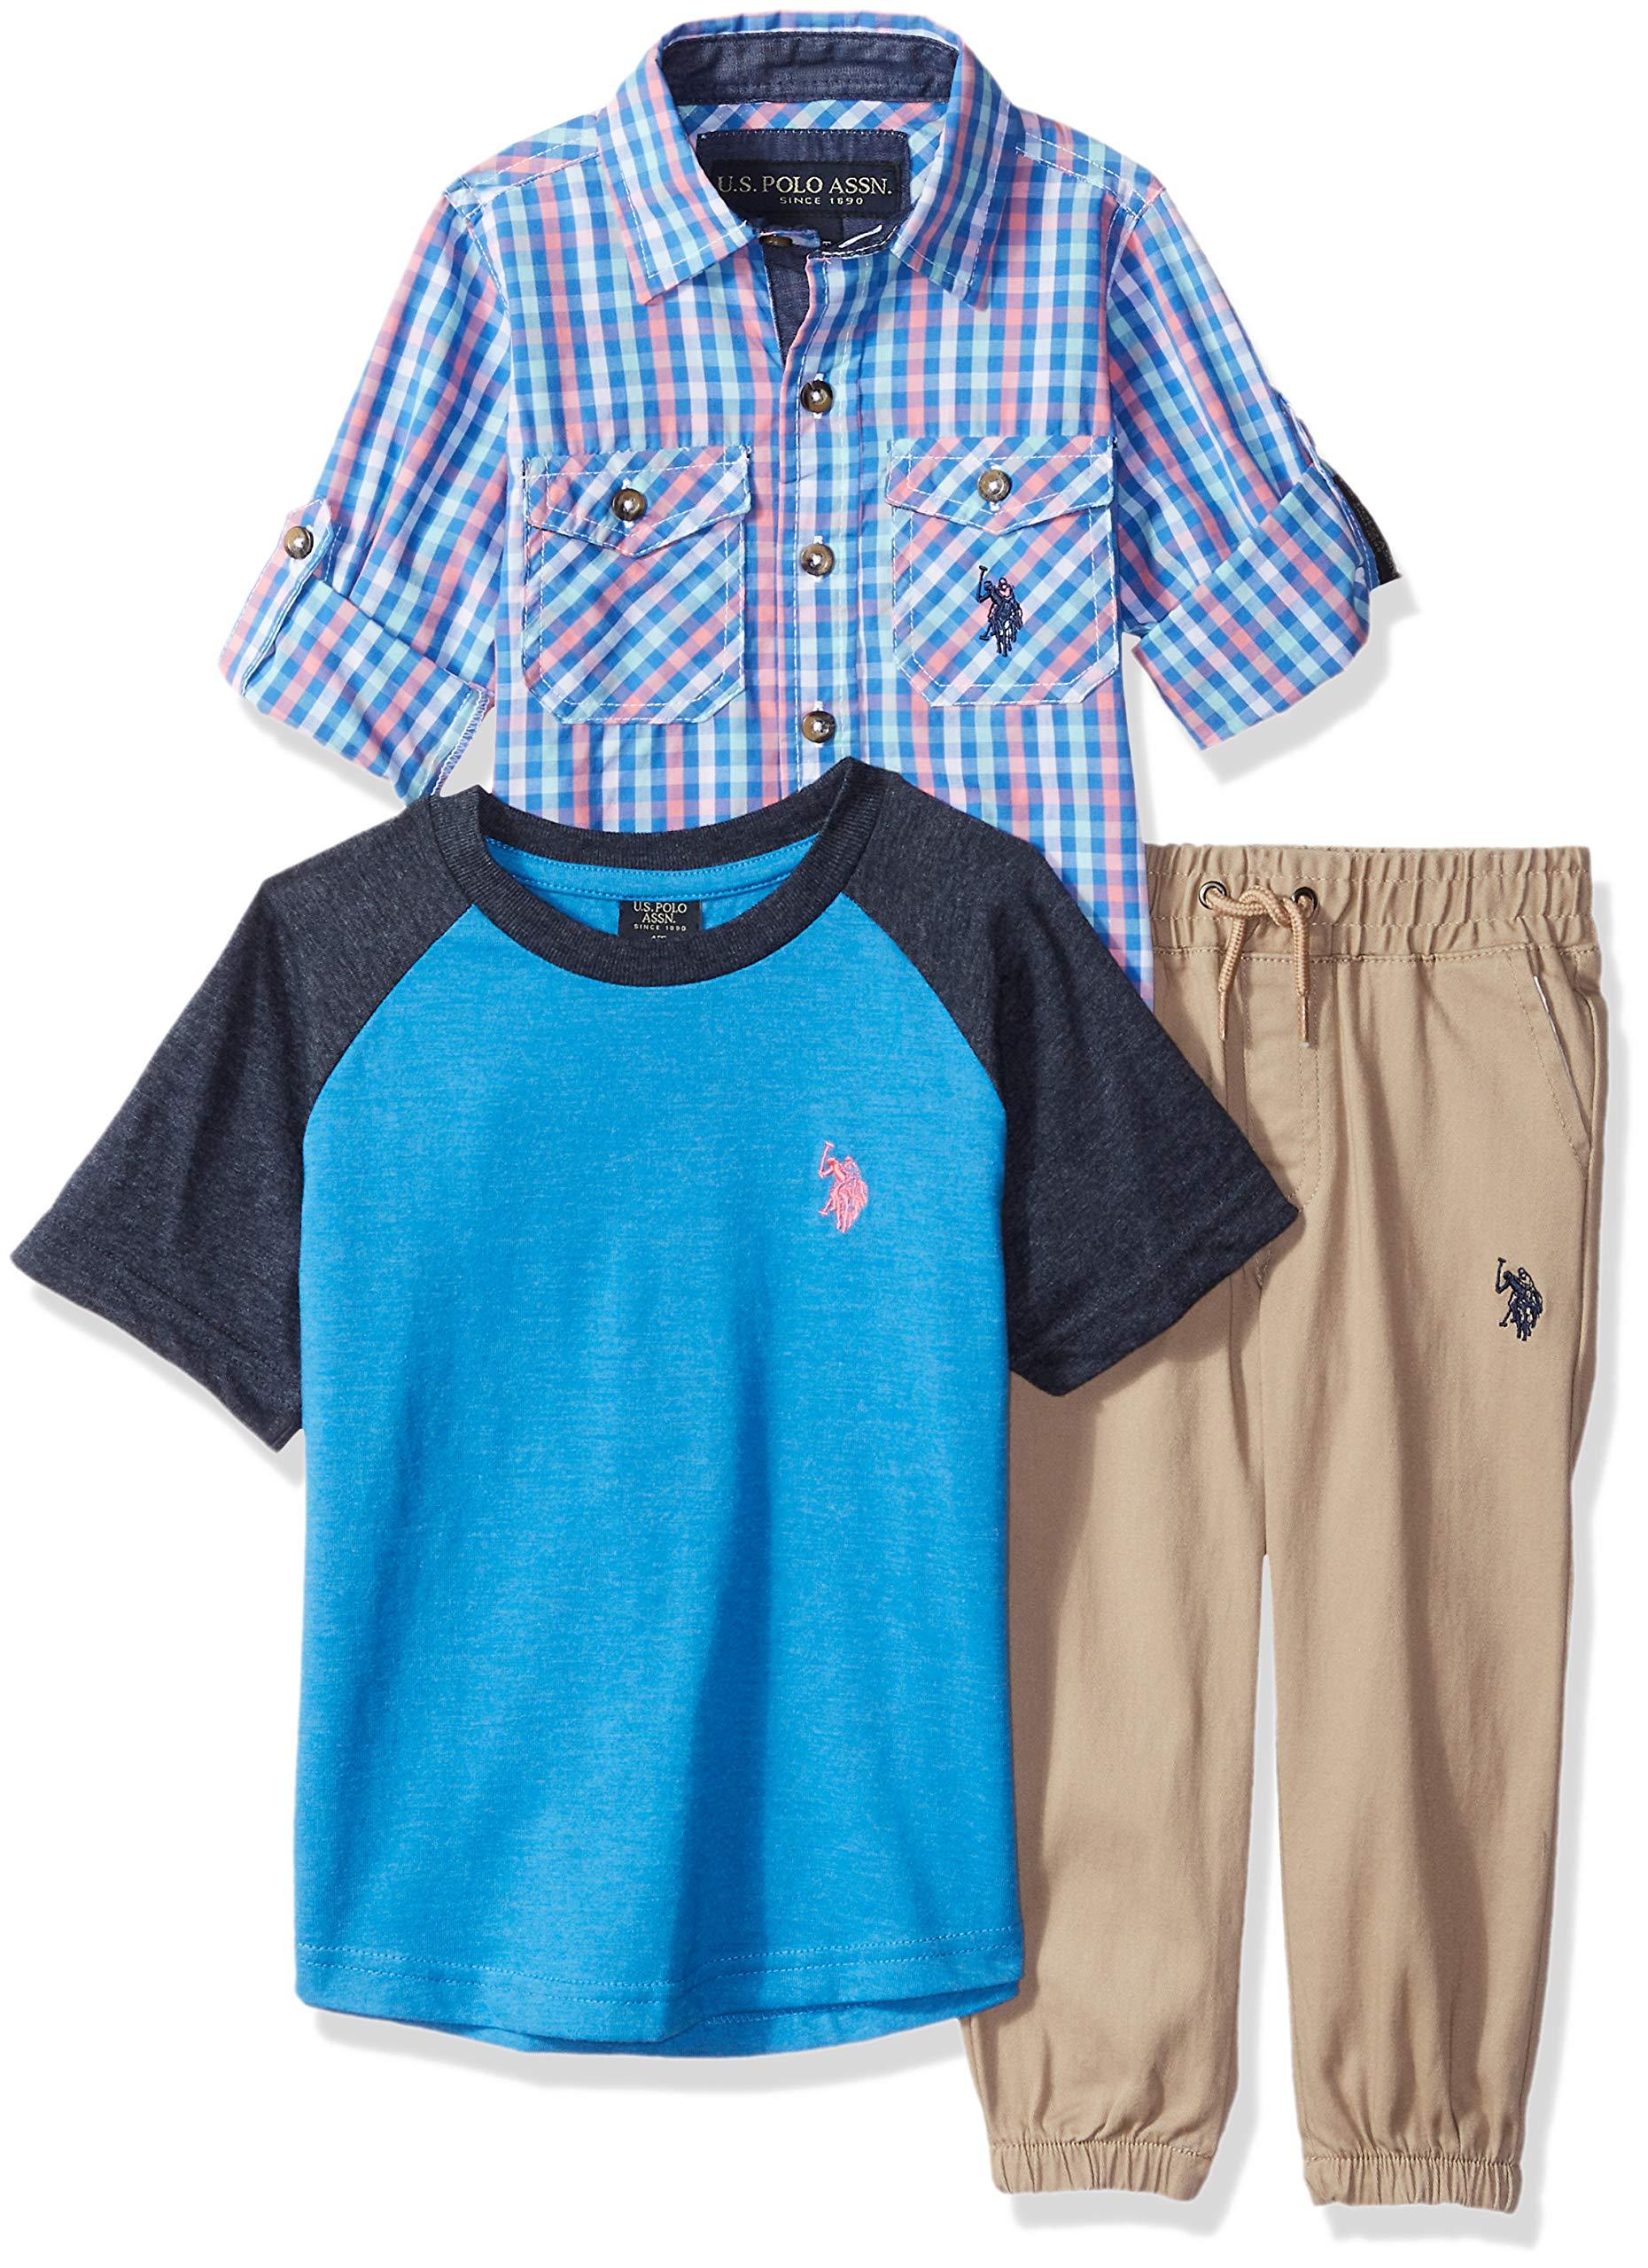 U.S. Polo Assn. Boys' Big T, Sport Shirt and Pant Set, Pink Multi Plaid, 10